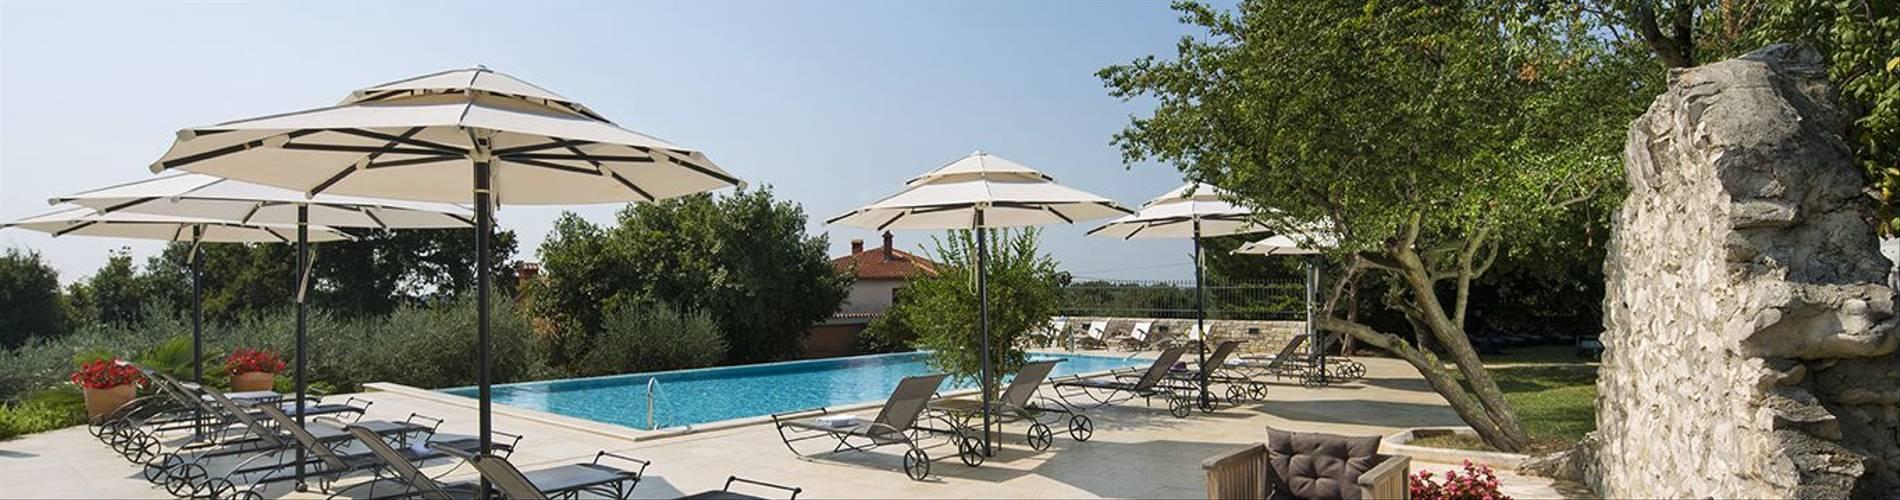 Heritage Hotel San Rocco, Istra, Croatia (15)small.jpg